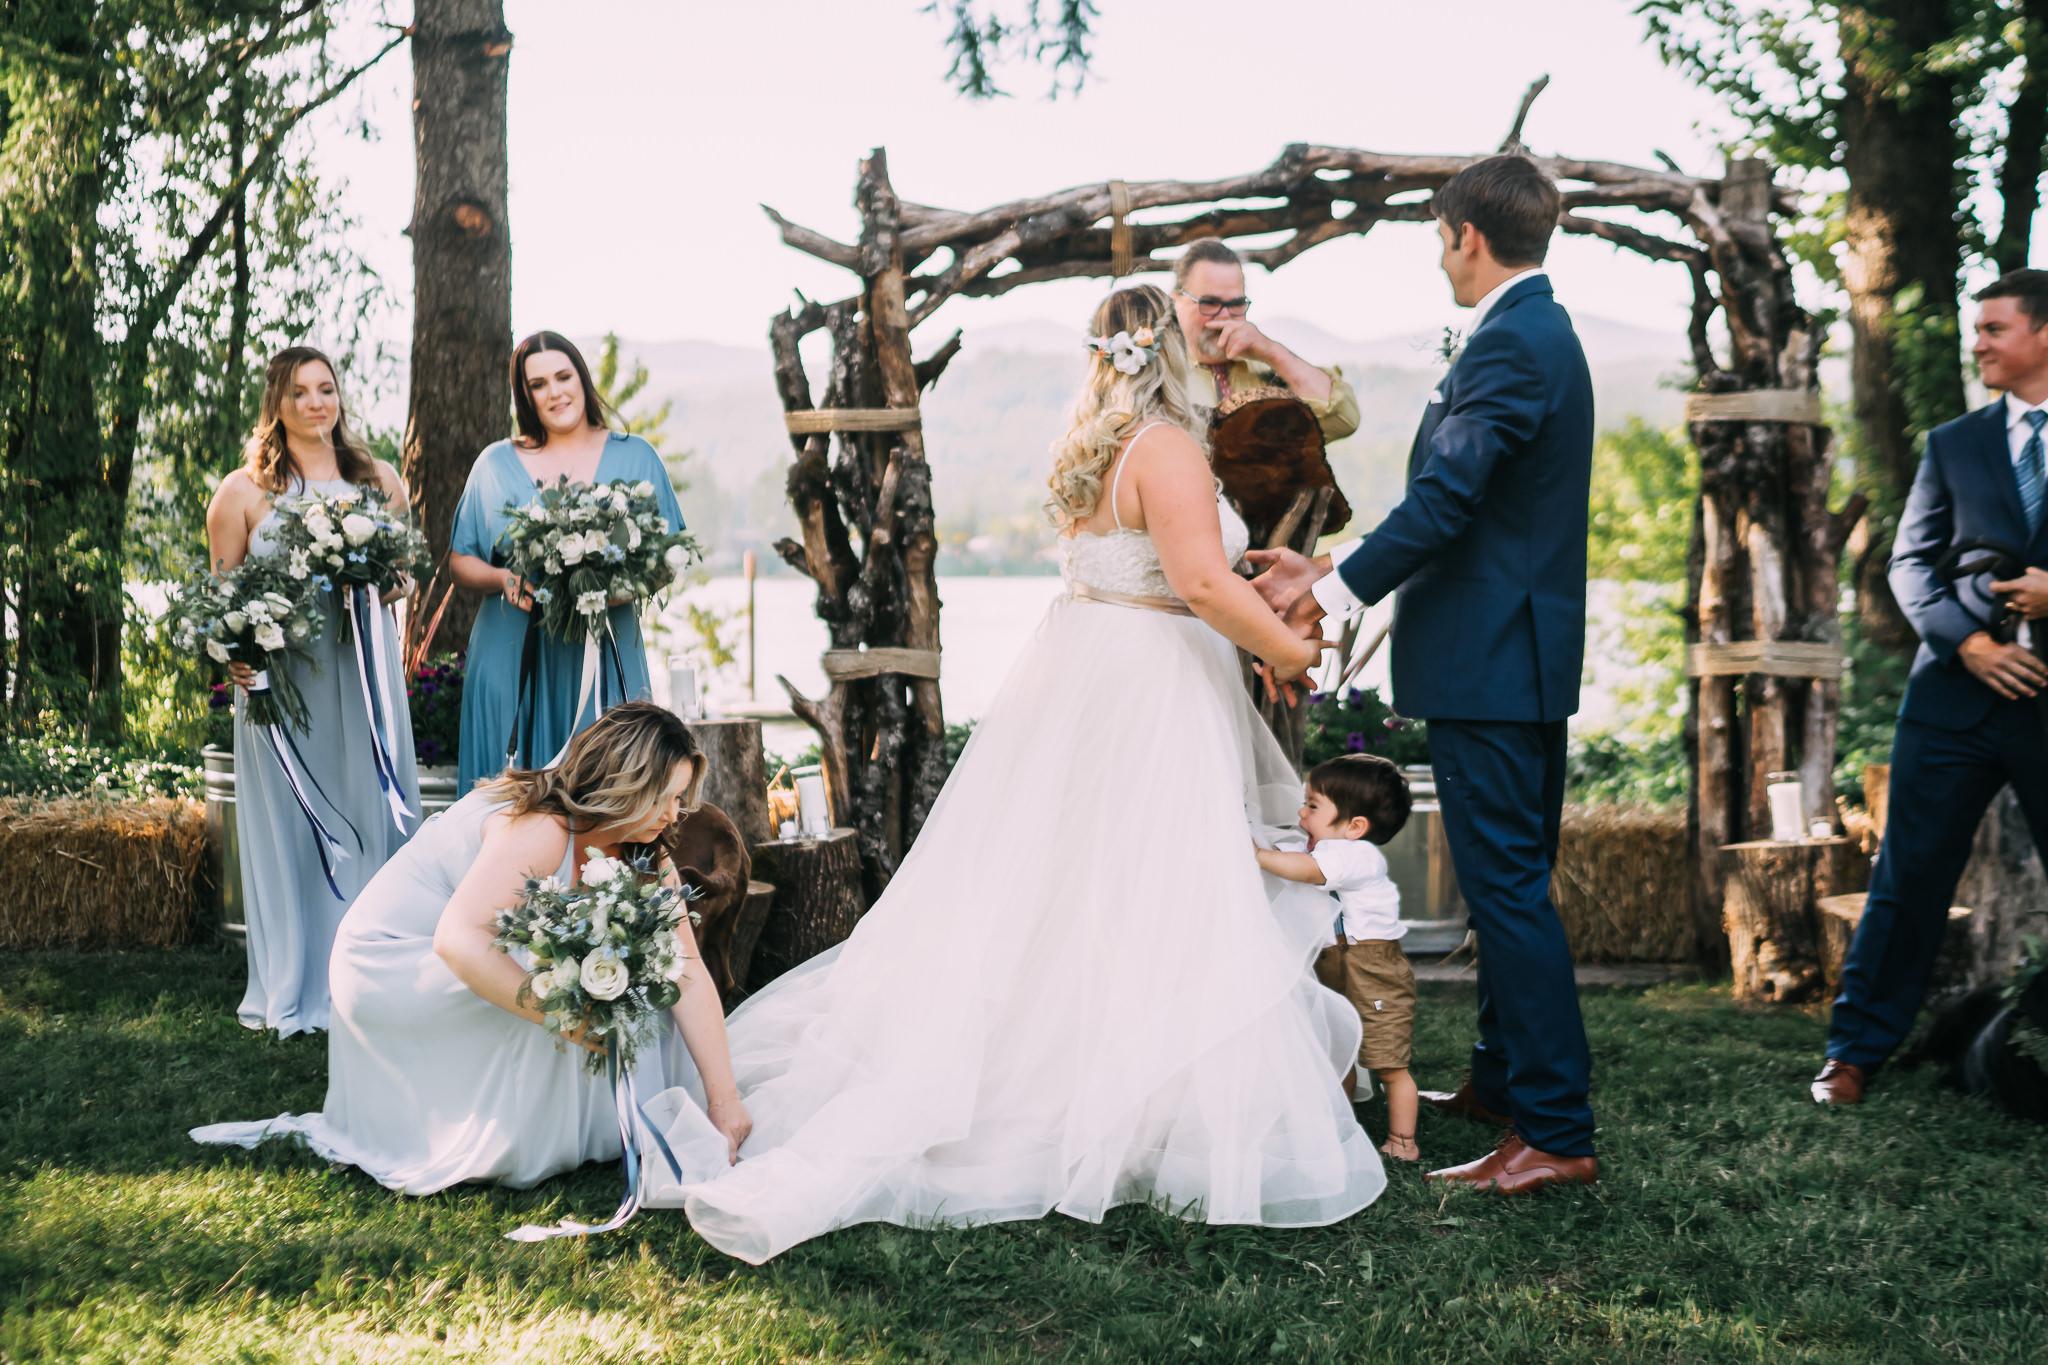 Bridesmaid fix fluff bride dress Columbia River Gorge wedding Alfred Tang